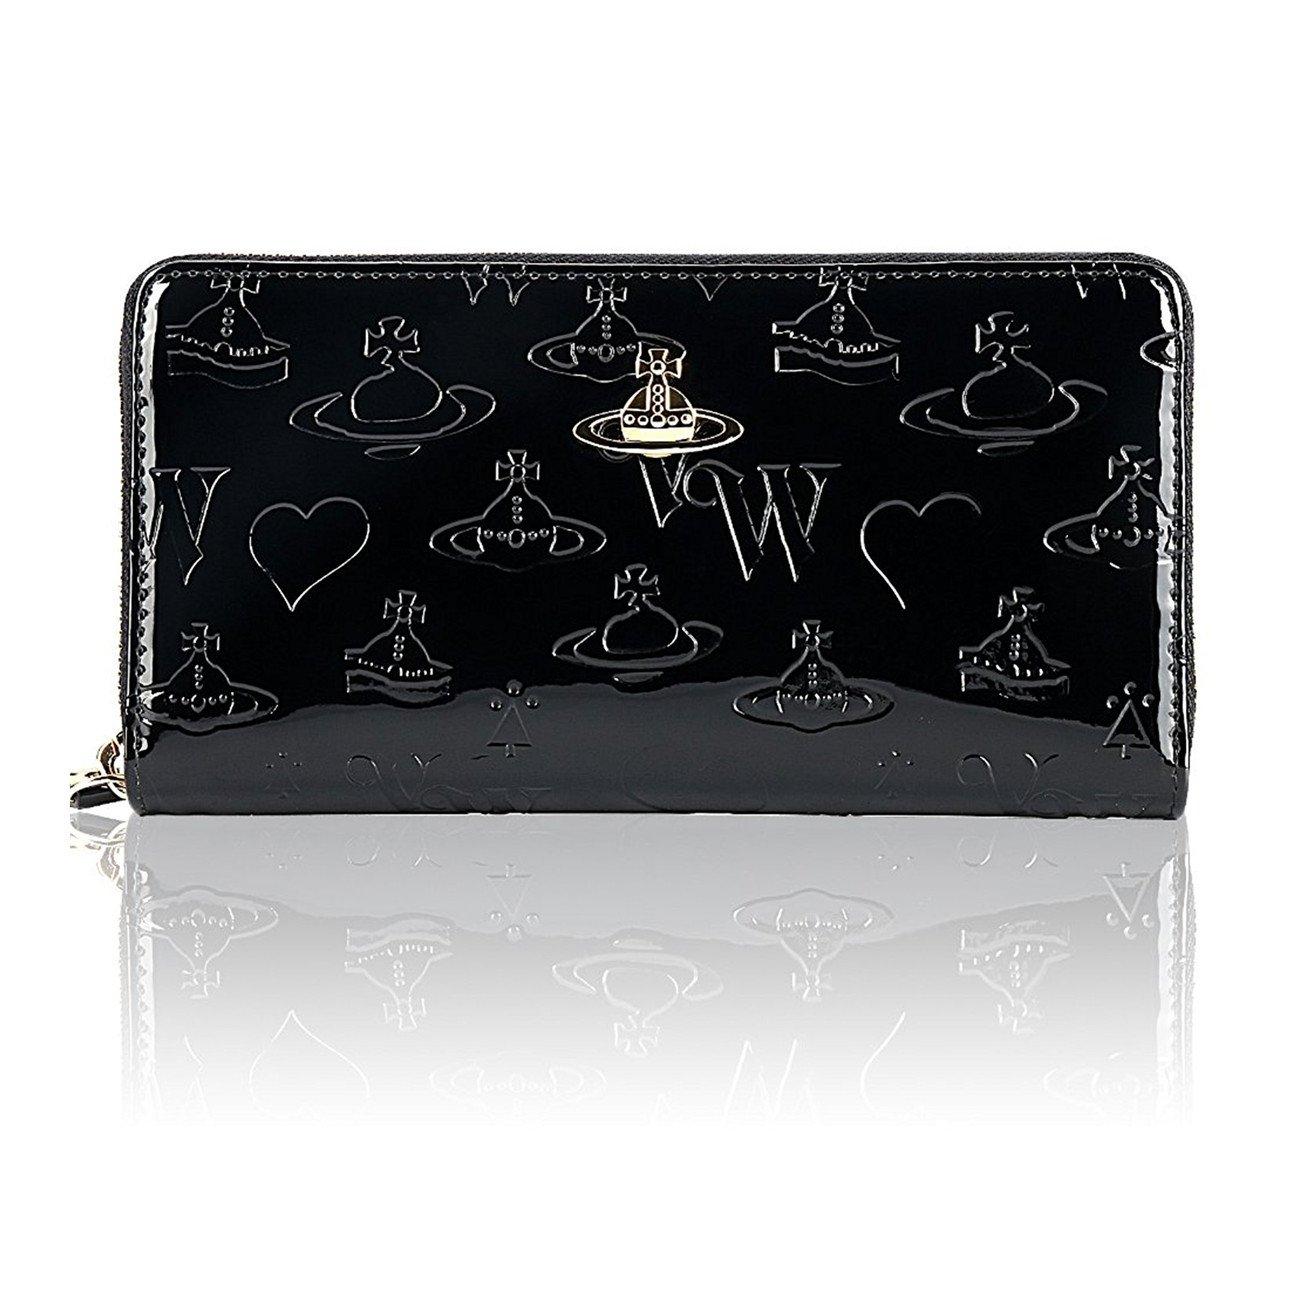 Vivienne Westwood ヴィヴィアンウエストウッド財布 長財布 55310 BLACK / RED/BLUE[並行輸入品] B079L6GF1M ブラック ブラック